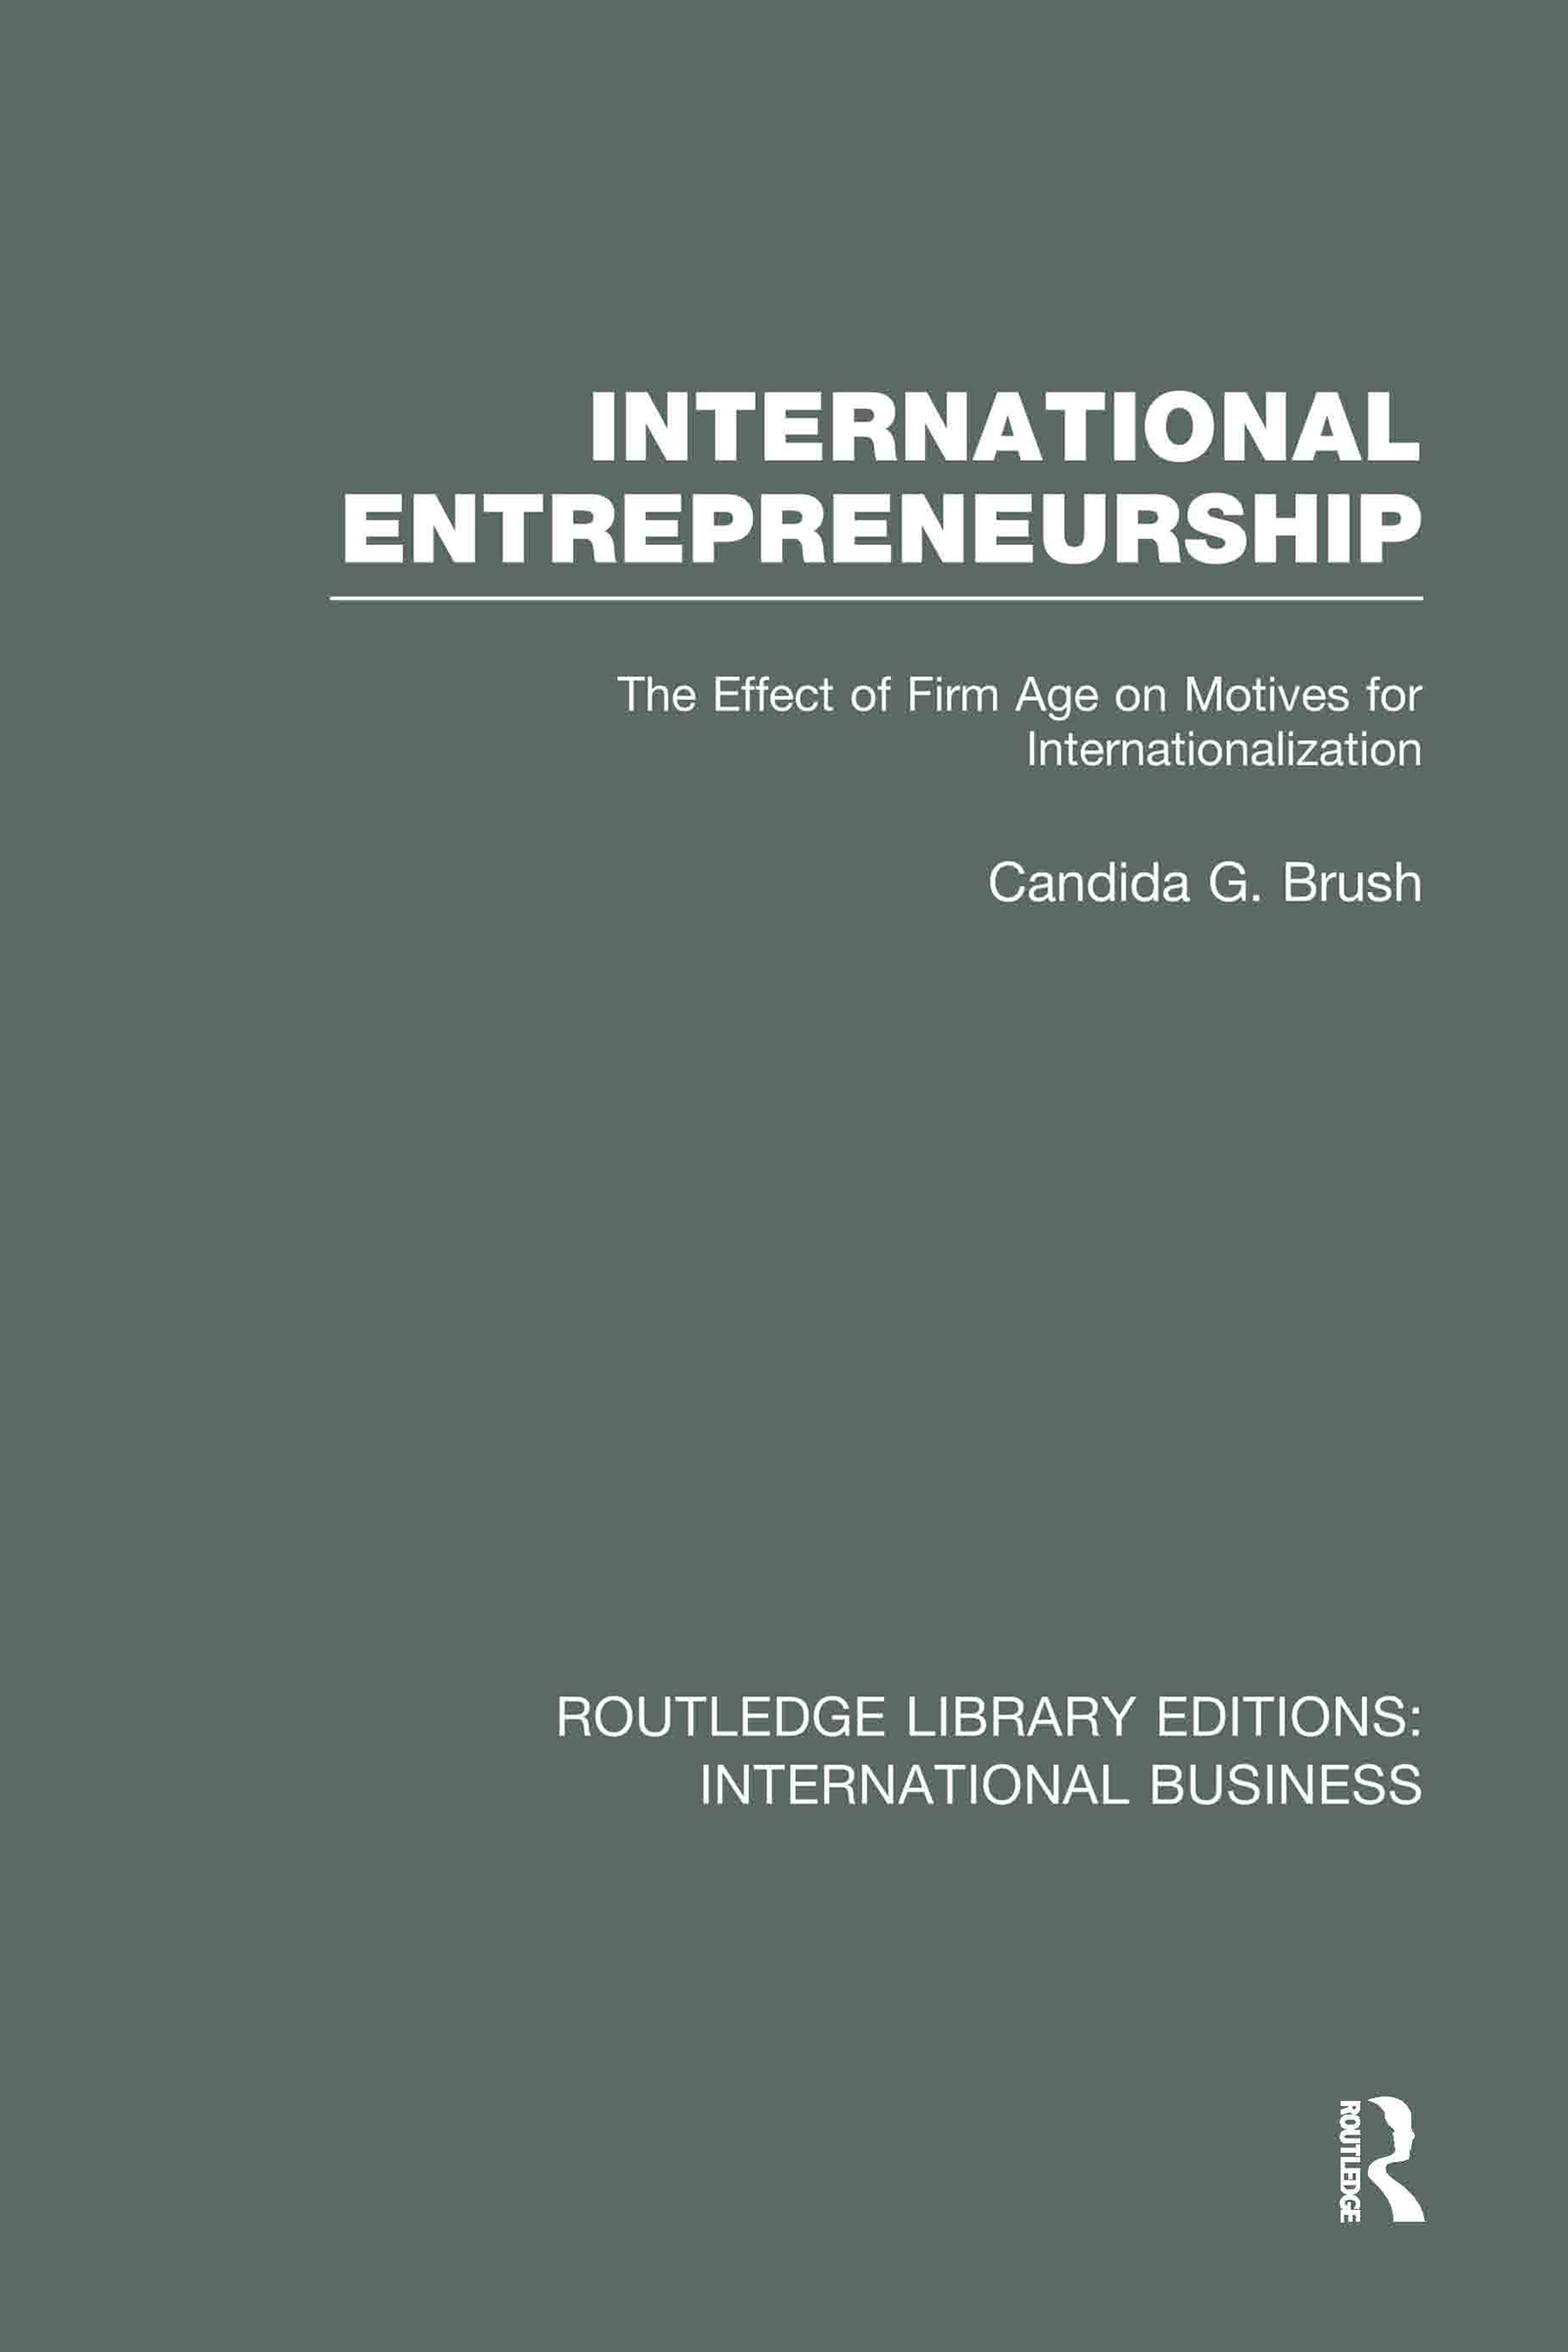 International Entrepreneurship (RLE International Business): The Effect of Firm Age on Motives for Internationalization book cover